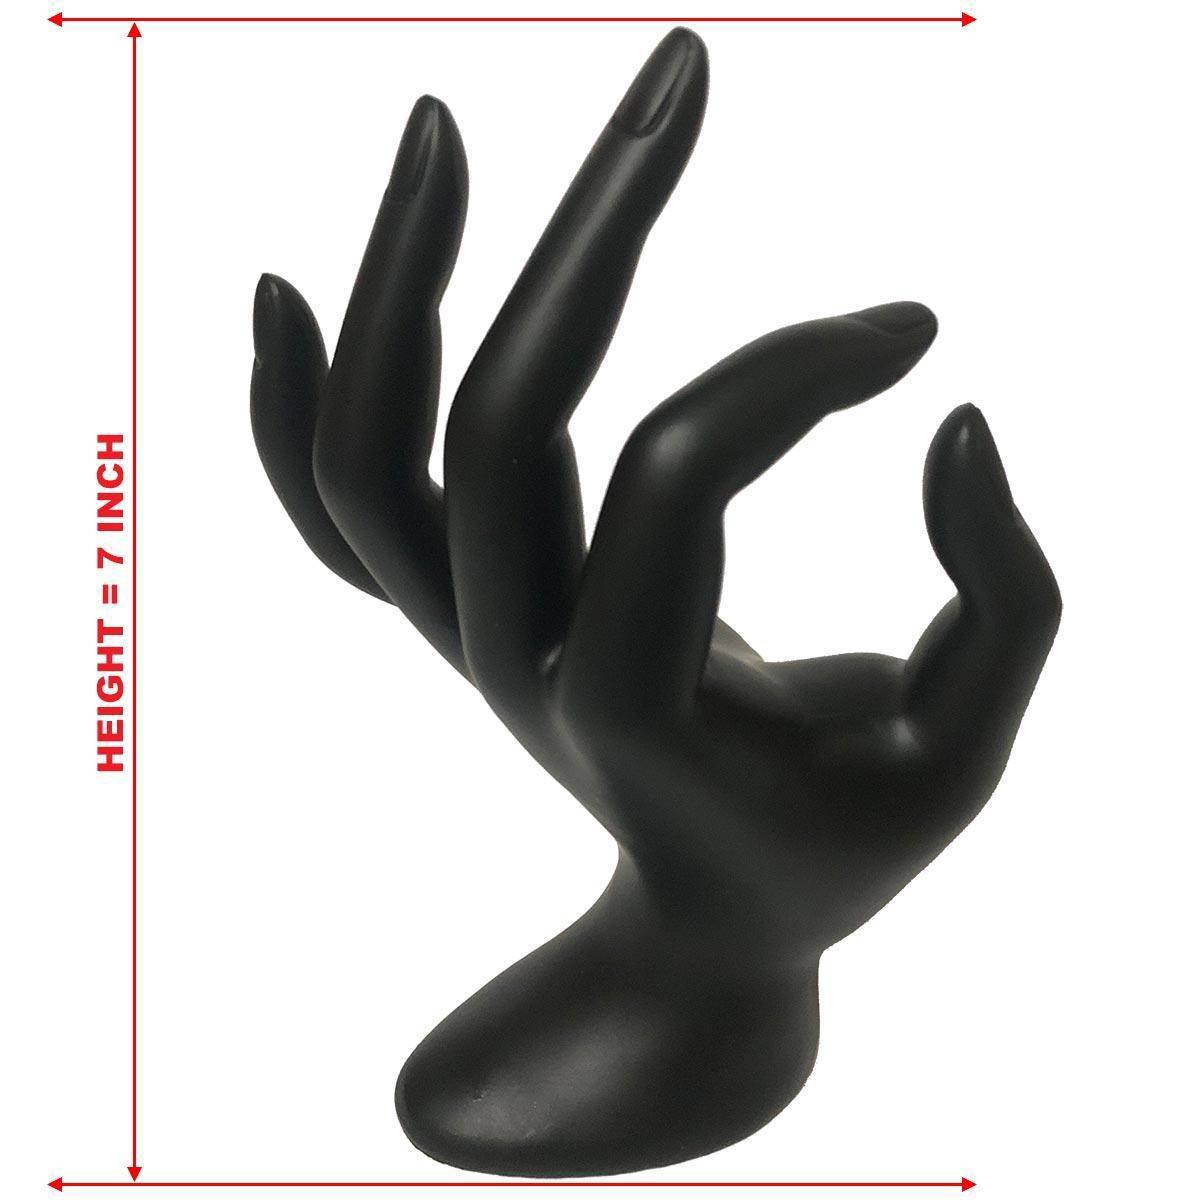 Jewellery Display Hanging Hand Holder Stand Show Rack Ring Bracelet Necklace - Black